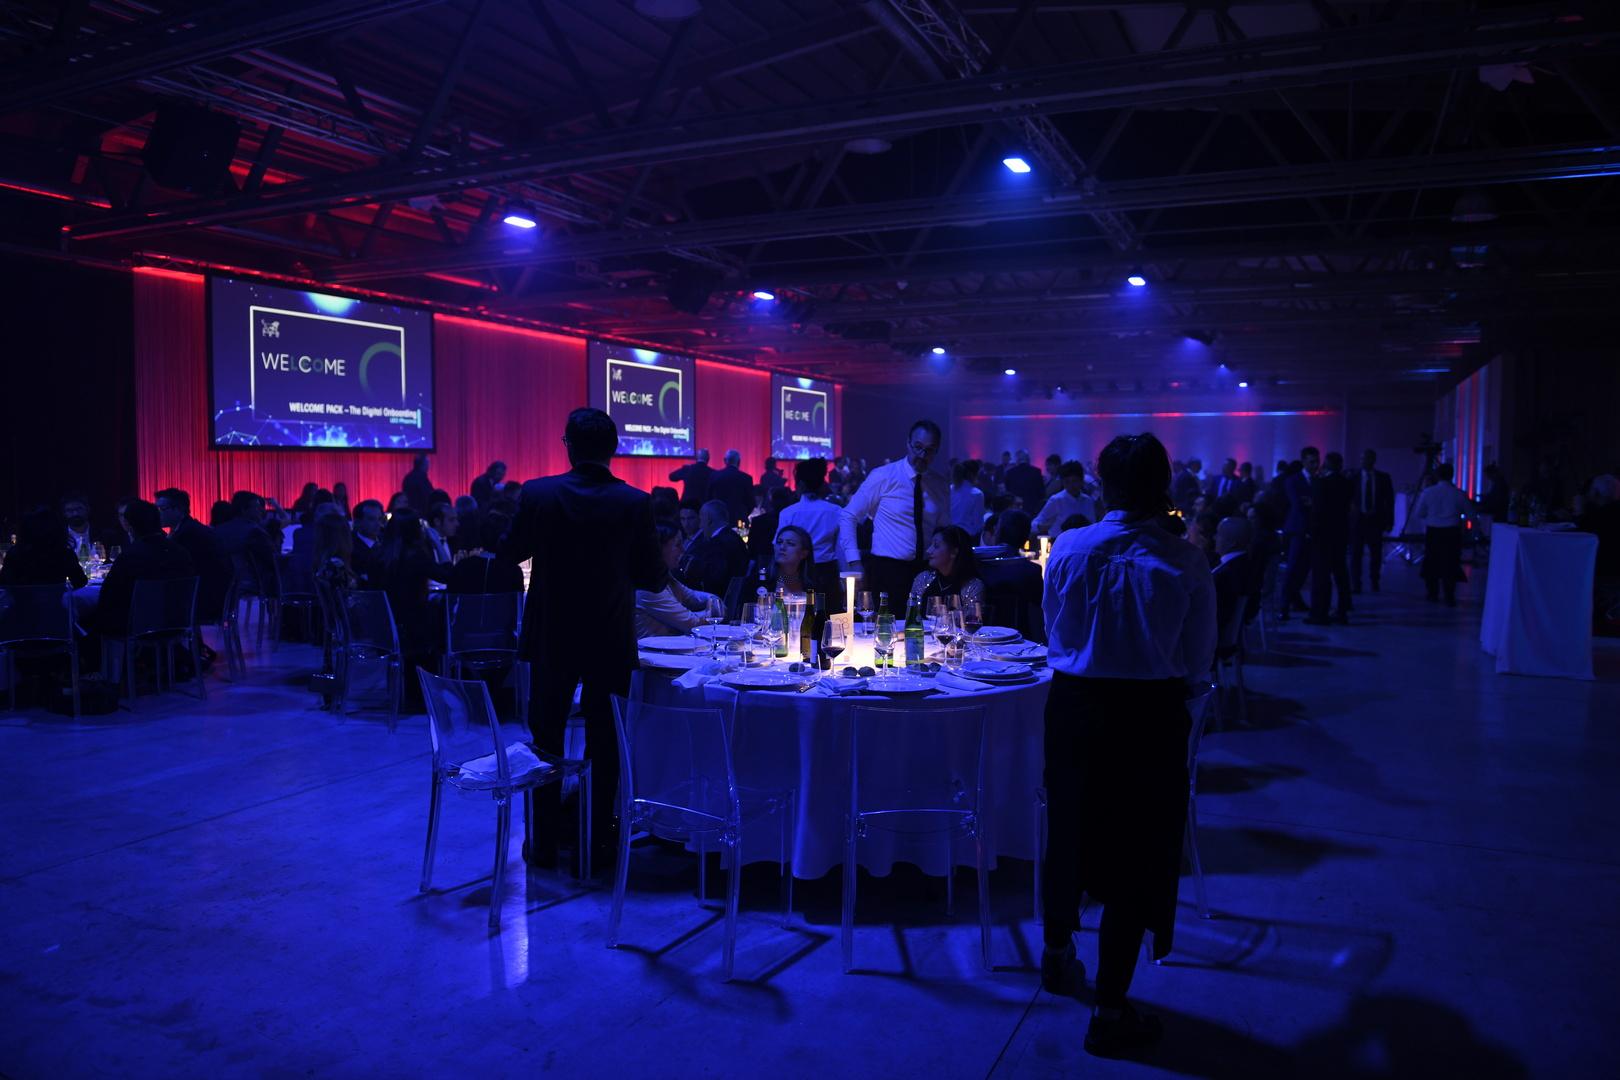 AboutPharma Digital Awards 2019 (13)